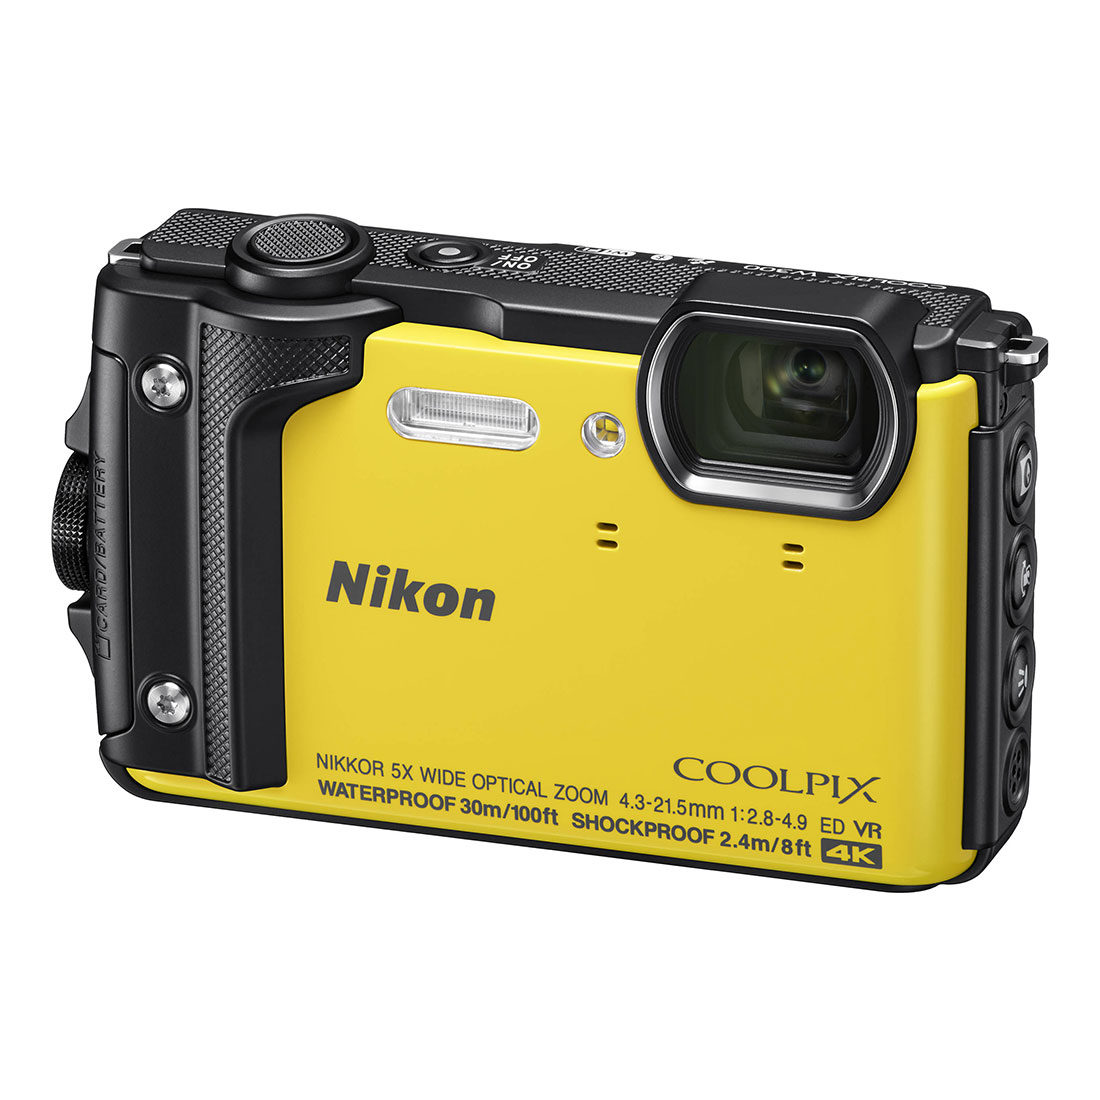 Nikon Coolpix W300 compact camera Geel <br/>€ 399.00 <br/> <a href='https://www.cameranu.nl/fotografie/?tt=12190_474631_241358_&r=https%3A%2F%2Fwww.cameranu.nl%2Fnl%2Fp1854375%2Fnikon-coolpix-w300-compact-camera-geel%3Fchannable%3De10841.MTg1NDM3NQ%26utm_campaign%3D%26utm_content%3DCompact%2Bcamera%26utm_source%3DTradetracker%26utm_medium%3Dcpc%26utm_term%3DDigitale%2Bcamera%26apos%3Bs' target='_blank'>naar de winkel</a>